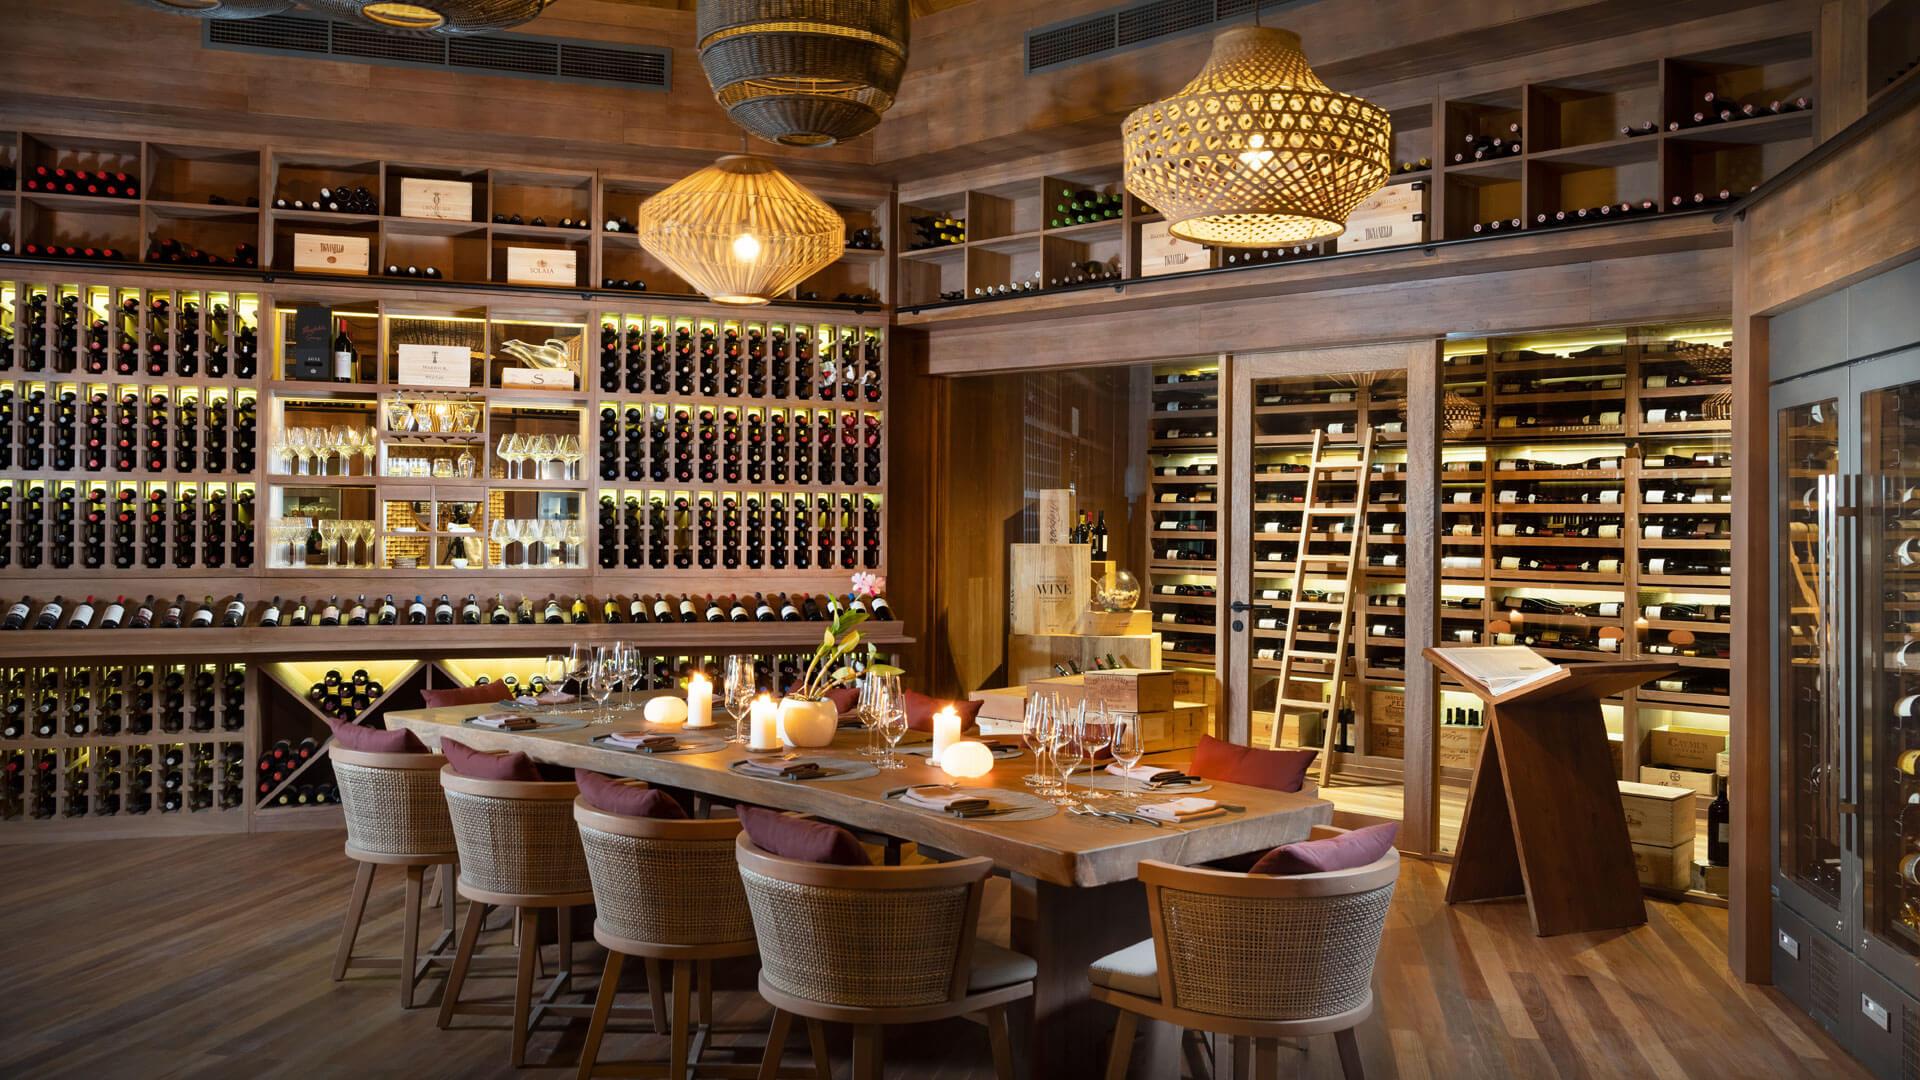 https://www.otdesign.com/wp-content/uploads/2021/04/vakkaru-wine-cellar.jpg